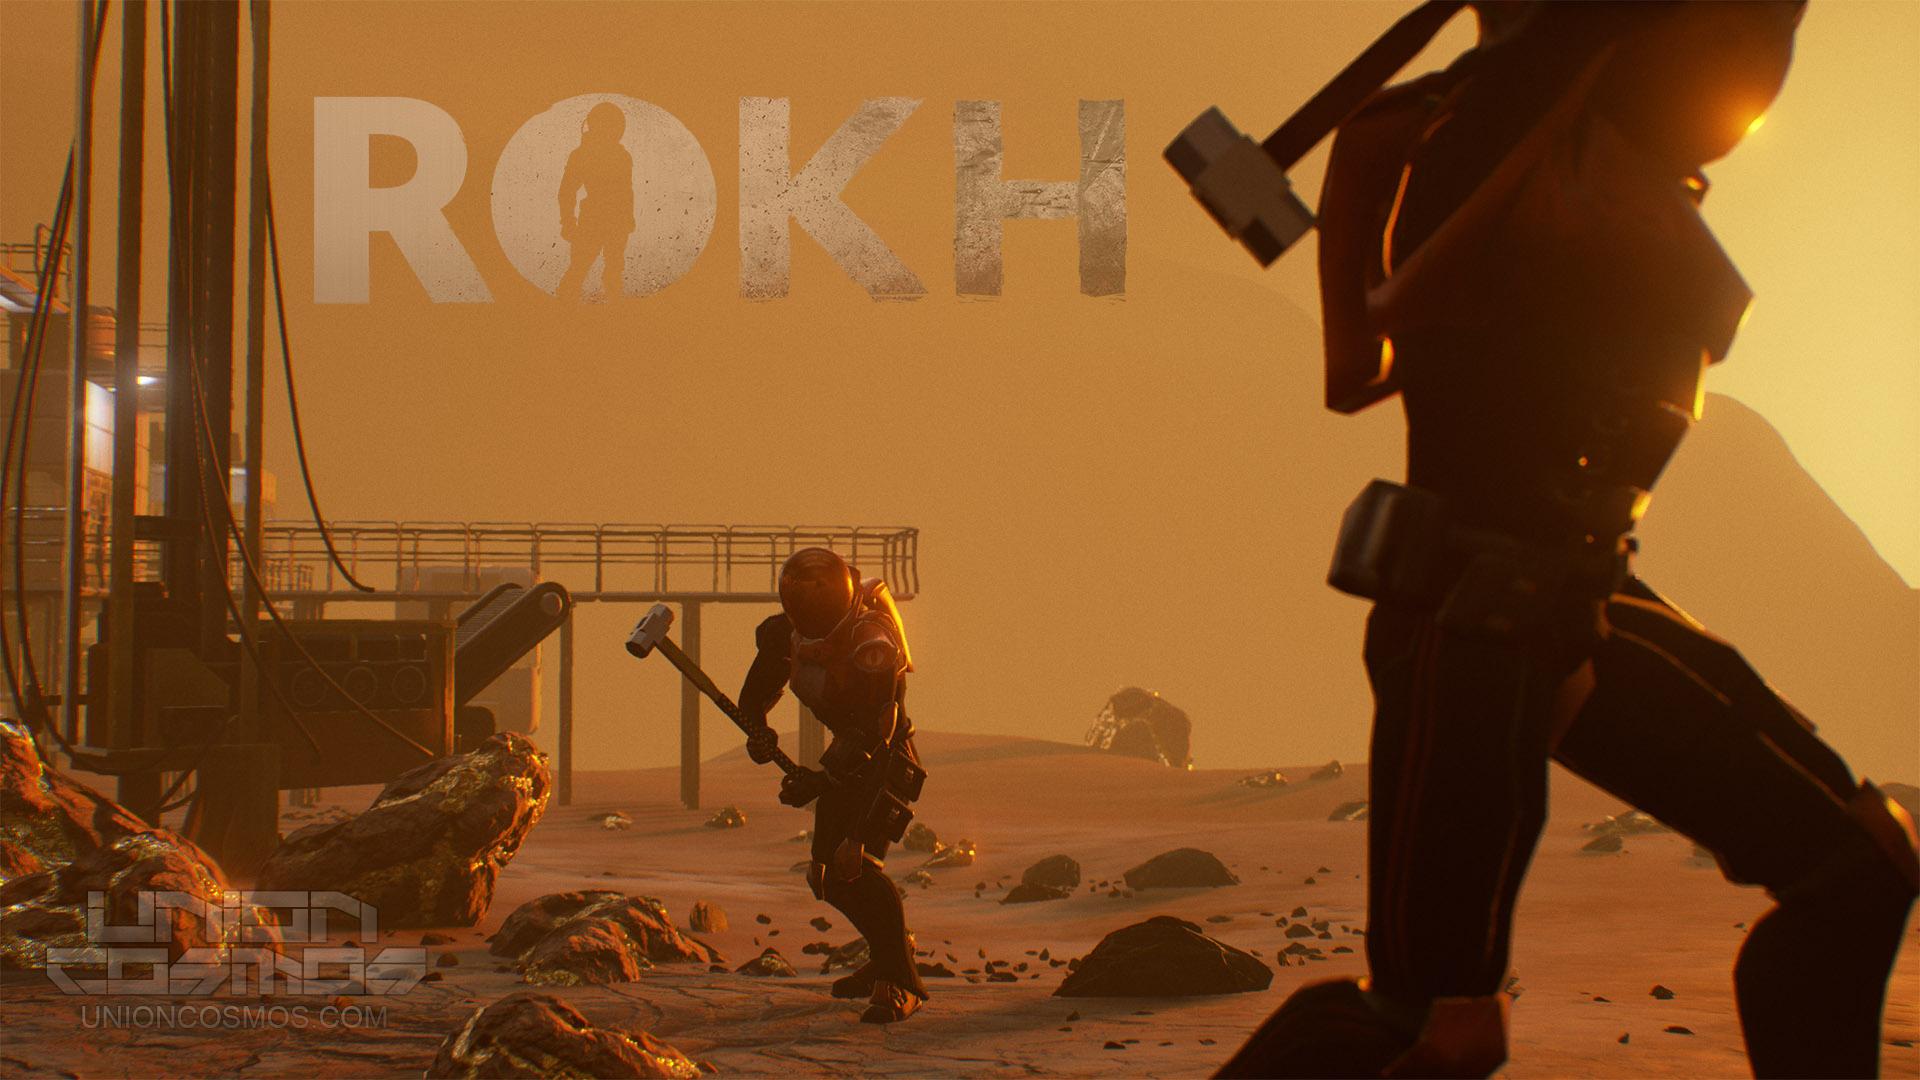 union-cosmos-rokh-screenshot-3